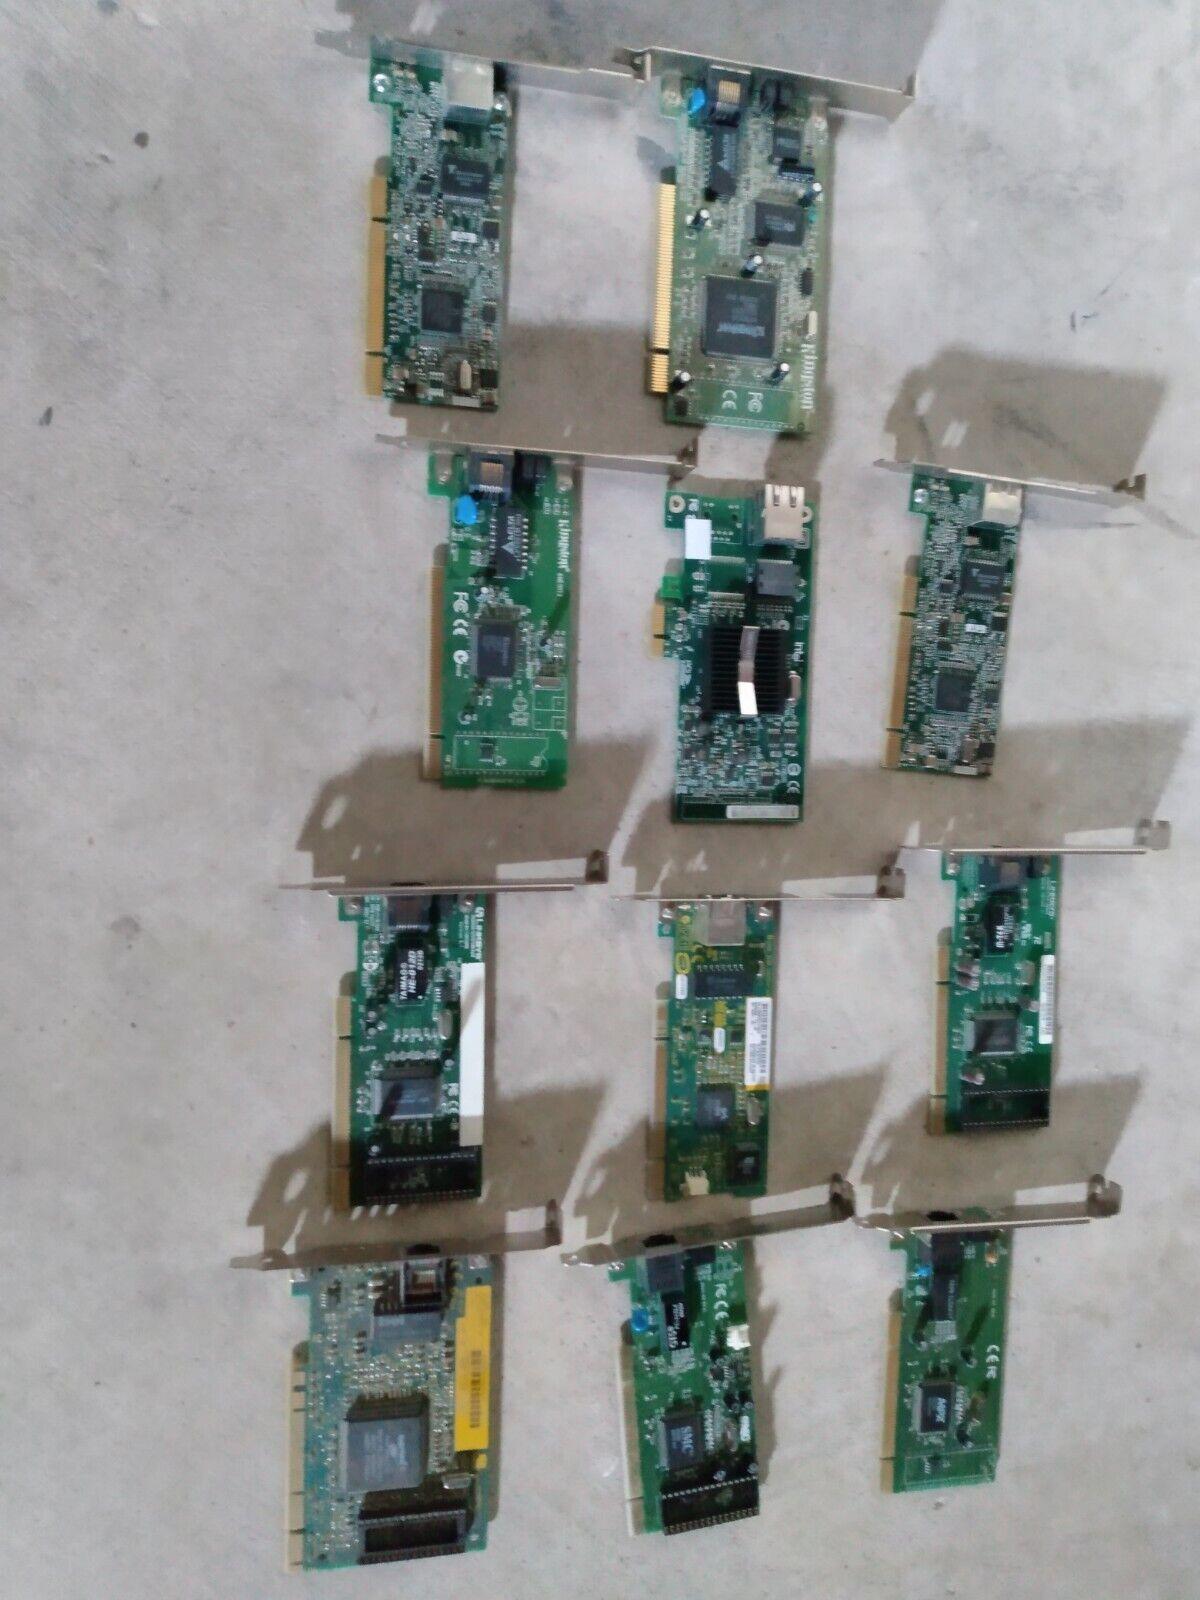 Lot of 11 ethernet cards